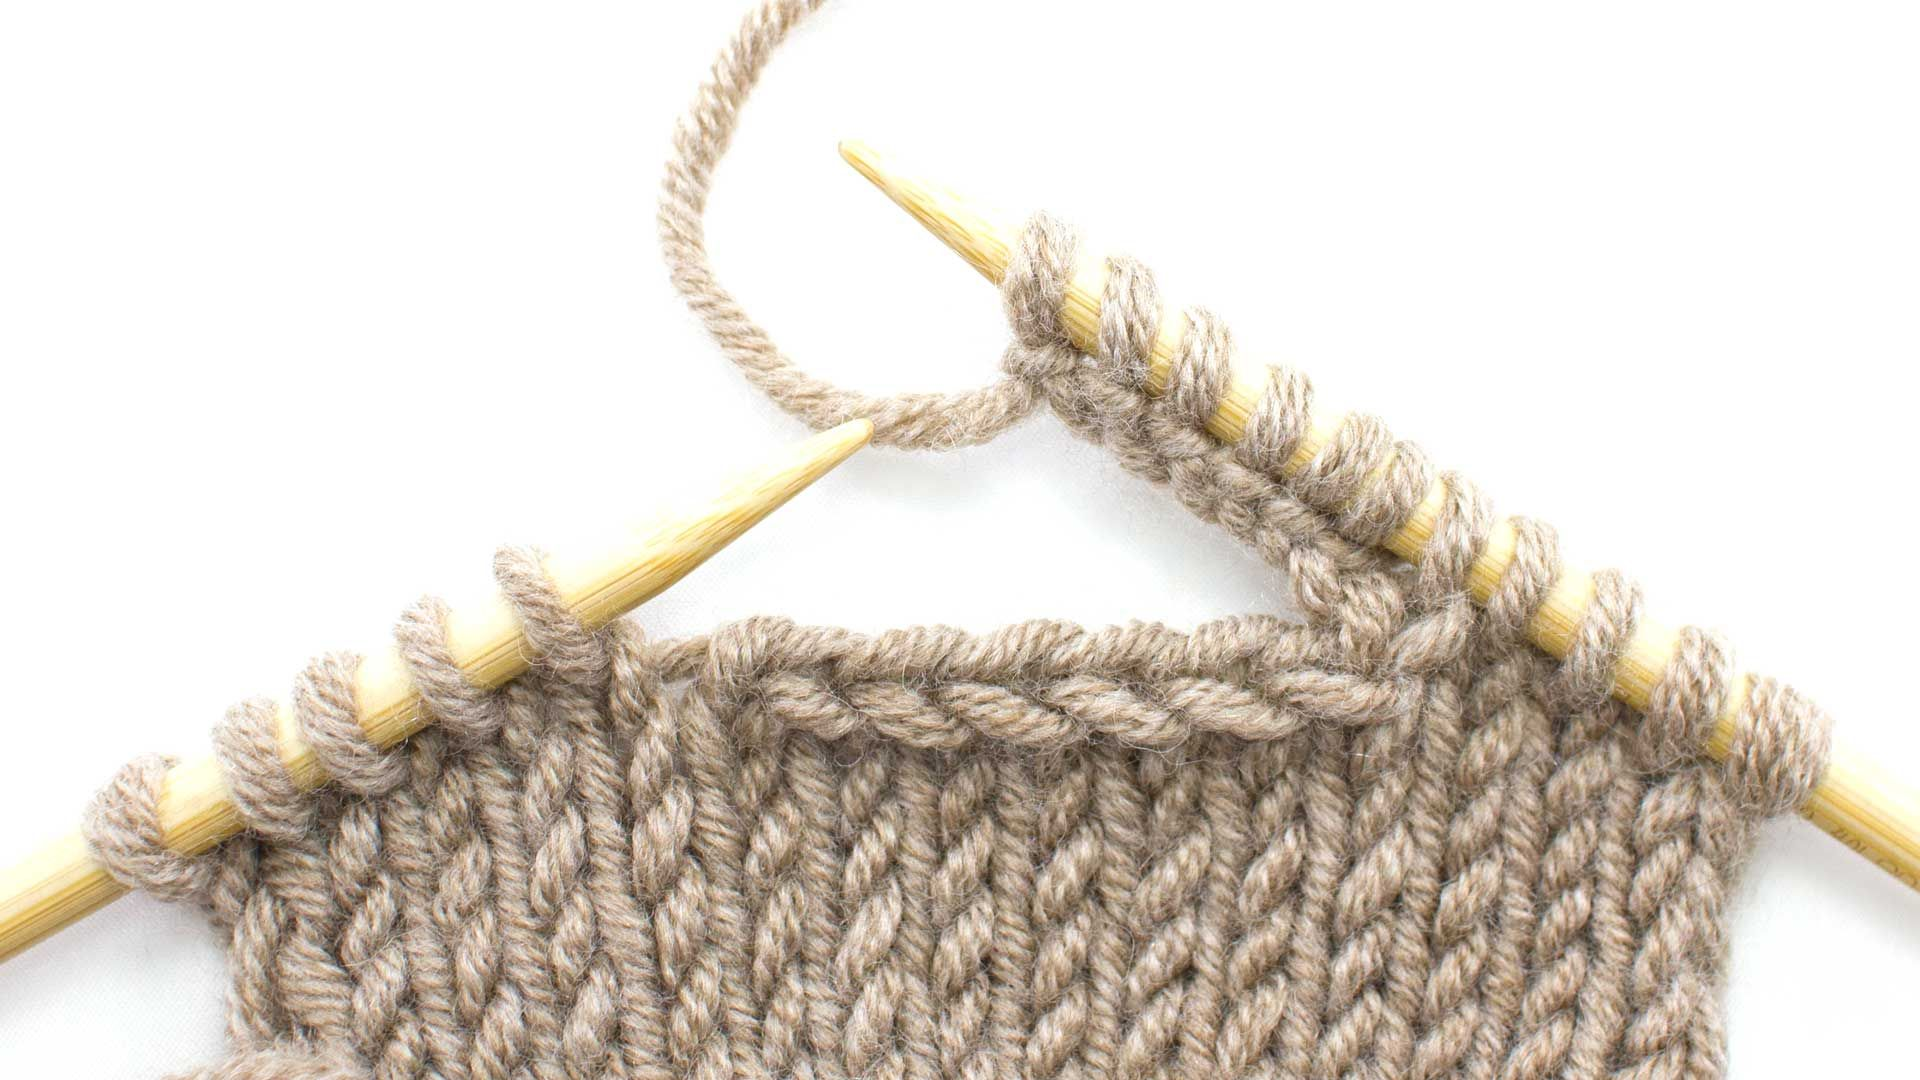 NEW STITCH A DAY New stitch a day, Knitting, Knit stitch